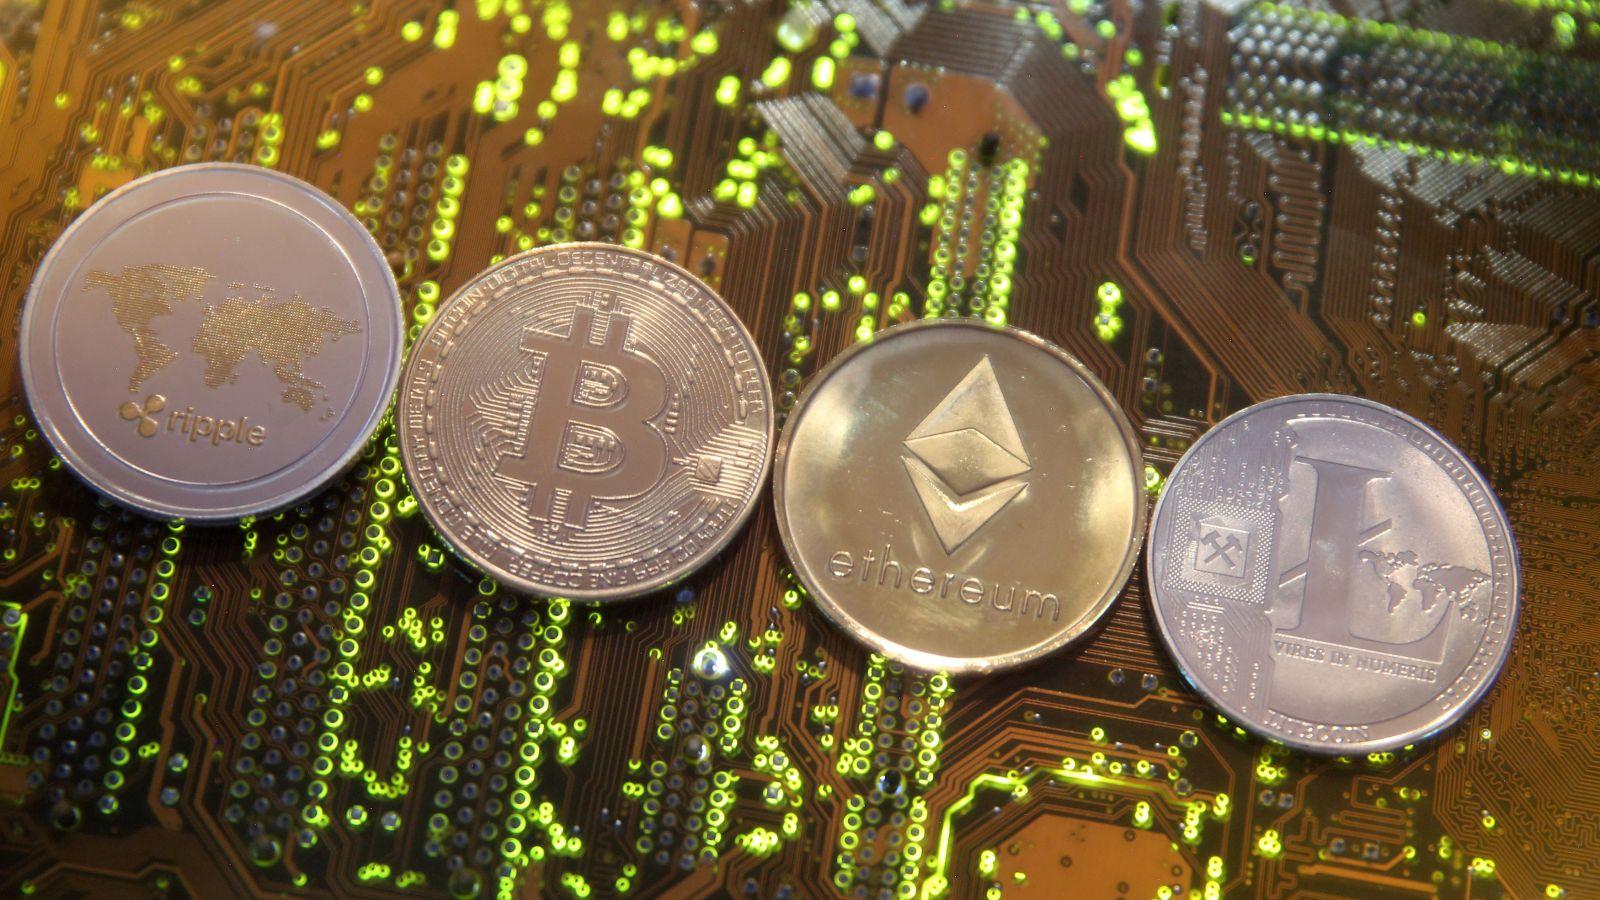 India's major Bitcoin exchange Zebpay stops trading in rupee amid banking freeze